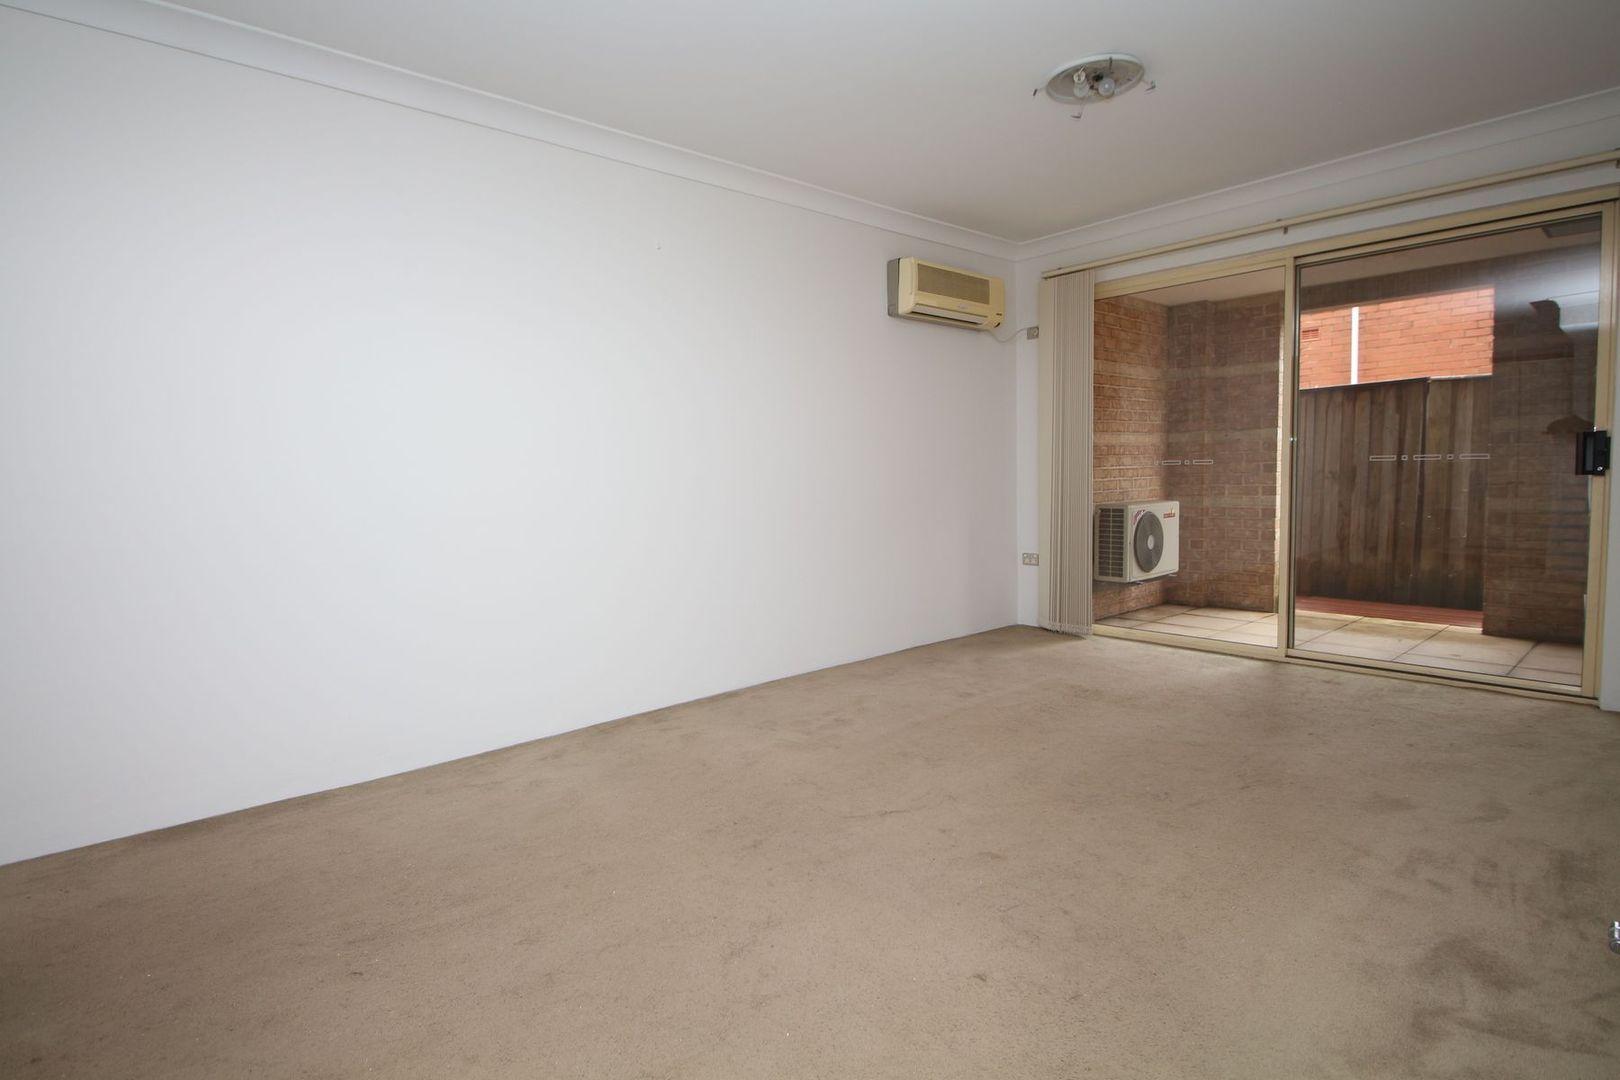 3/68 Macarthur Street, Parramatta NSW 2150, Image 1